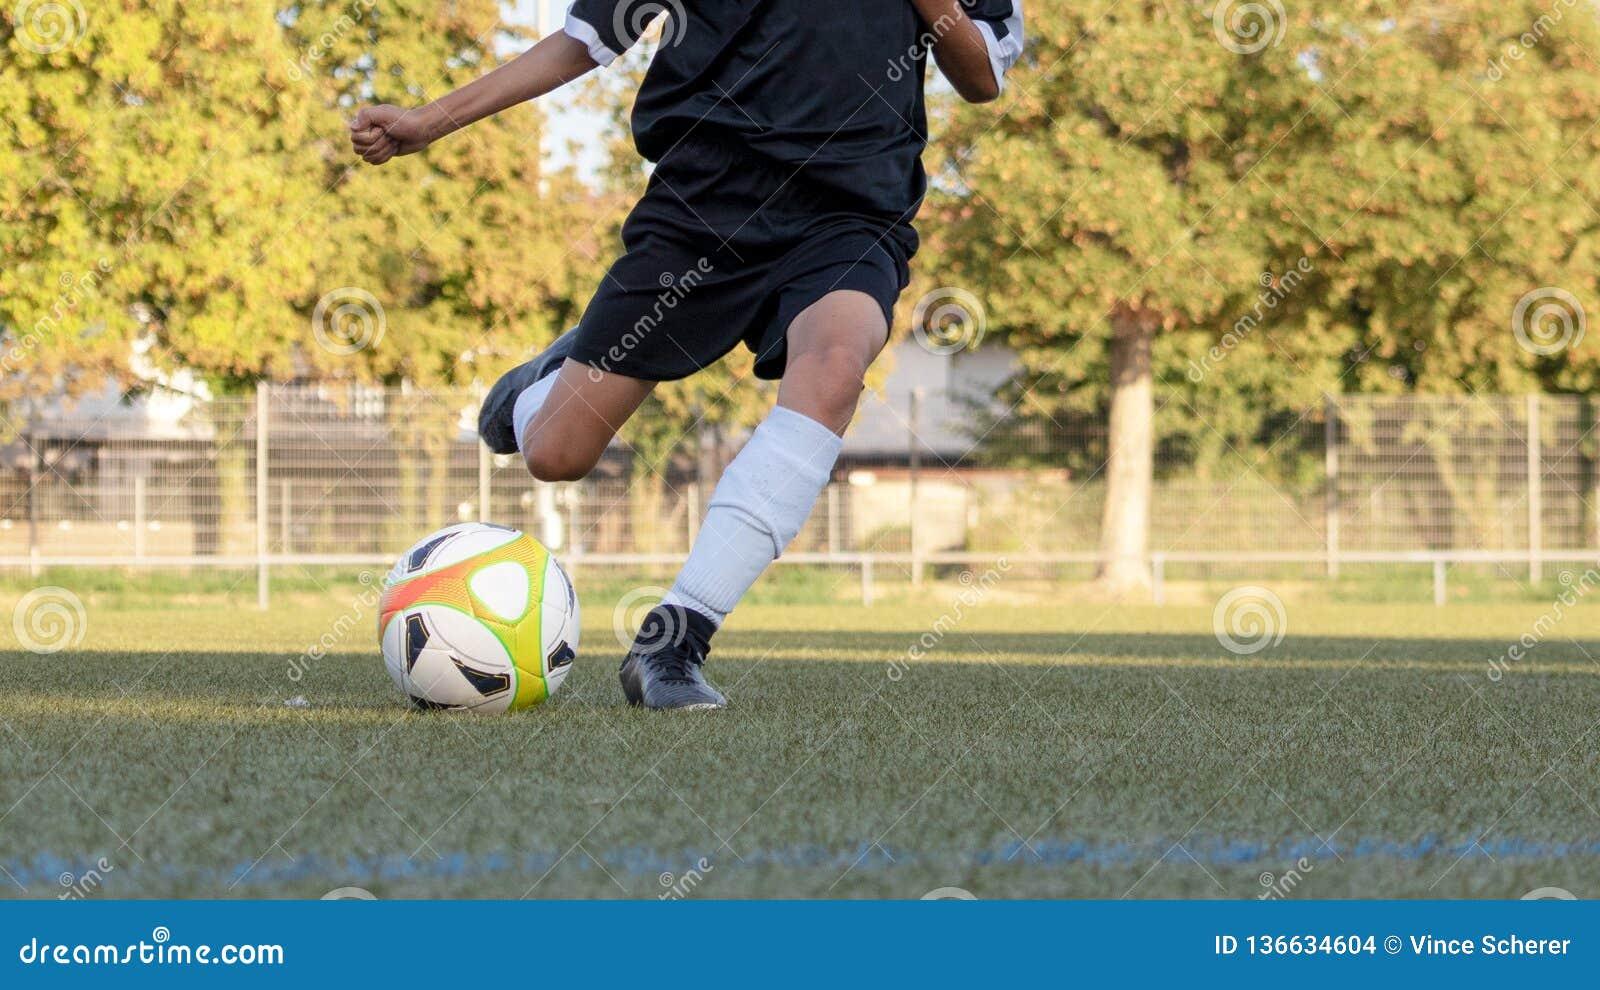 Voetballer in actieclose-up